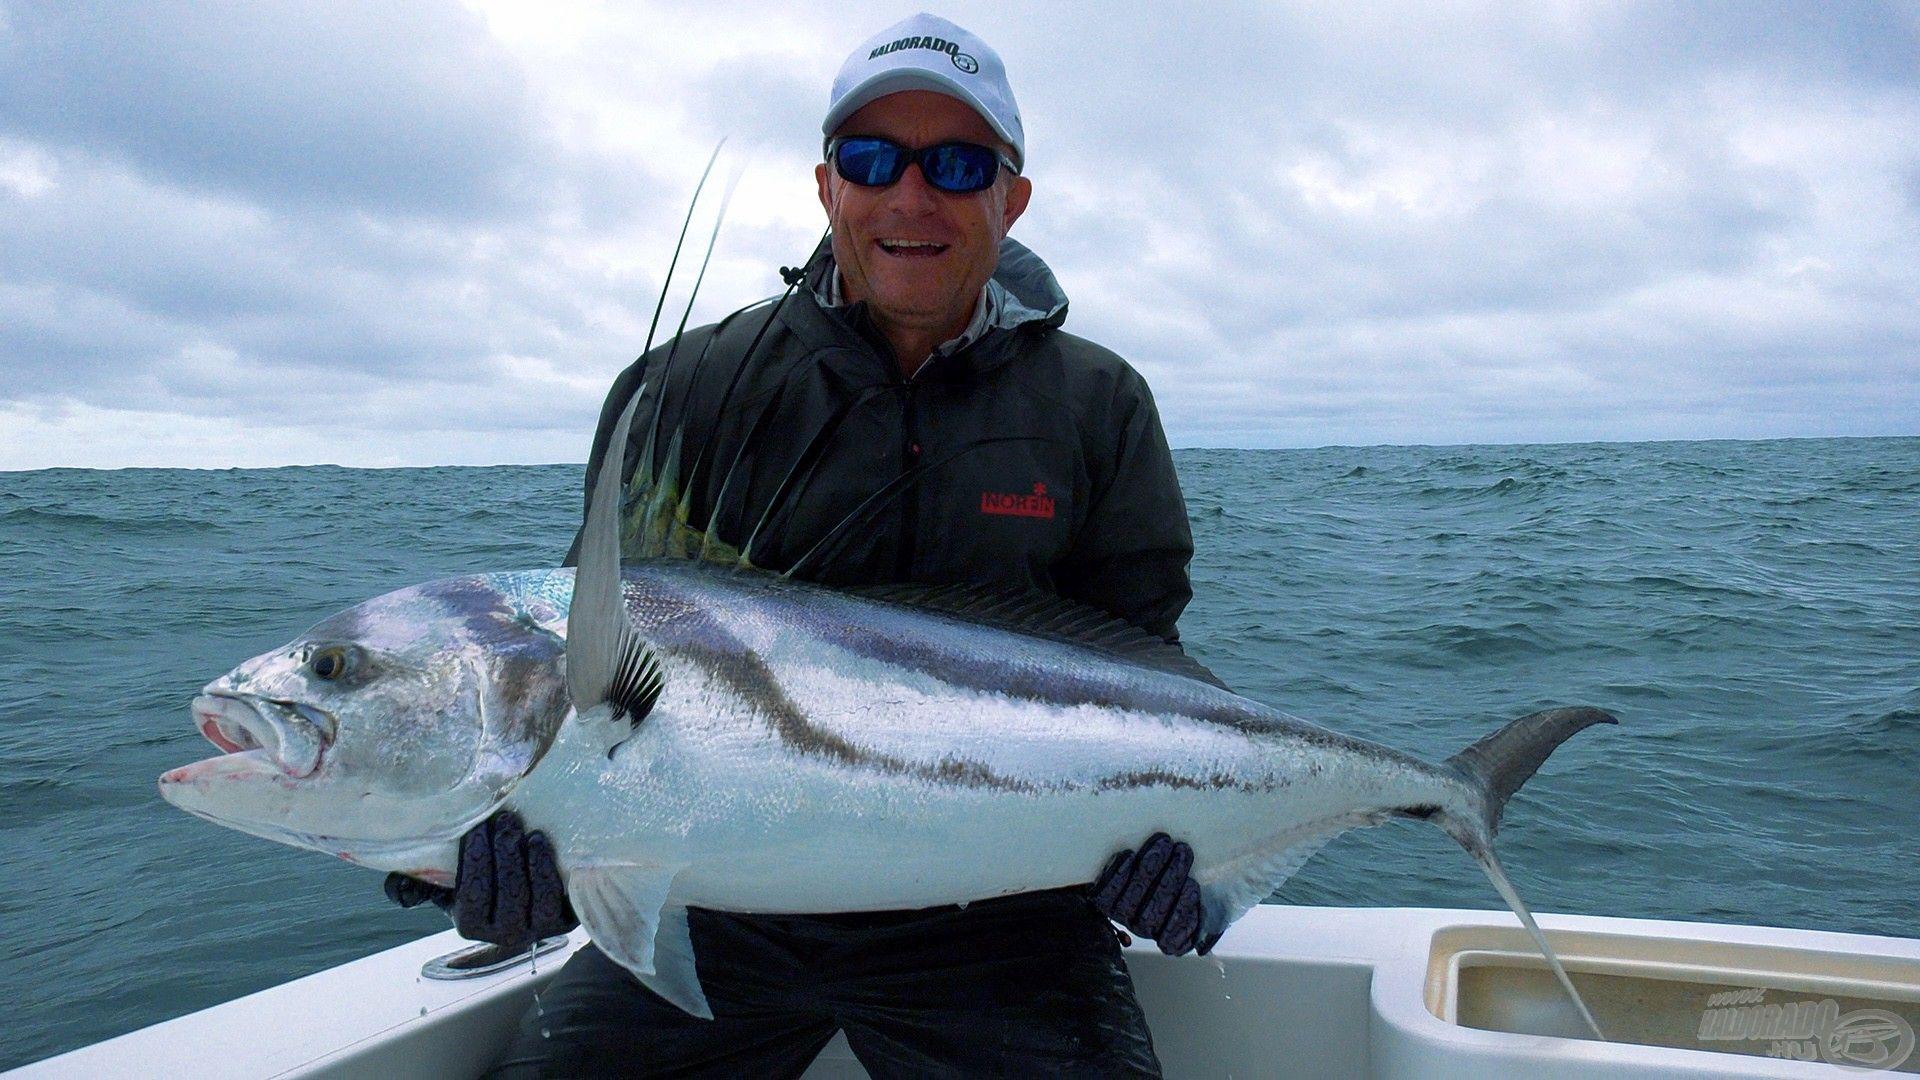 20 kg feletti roosterfish